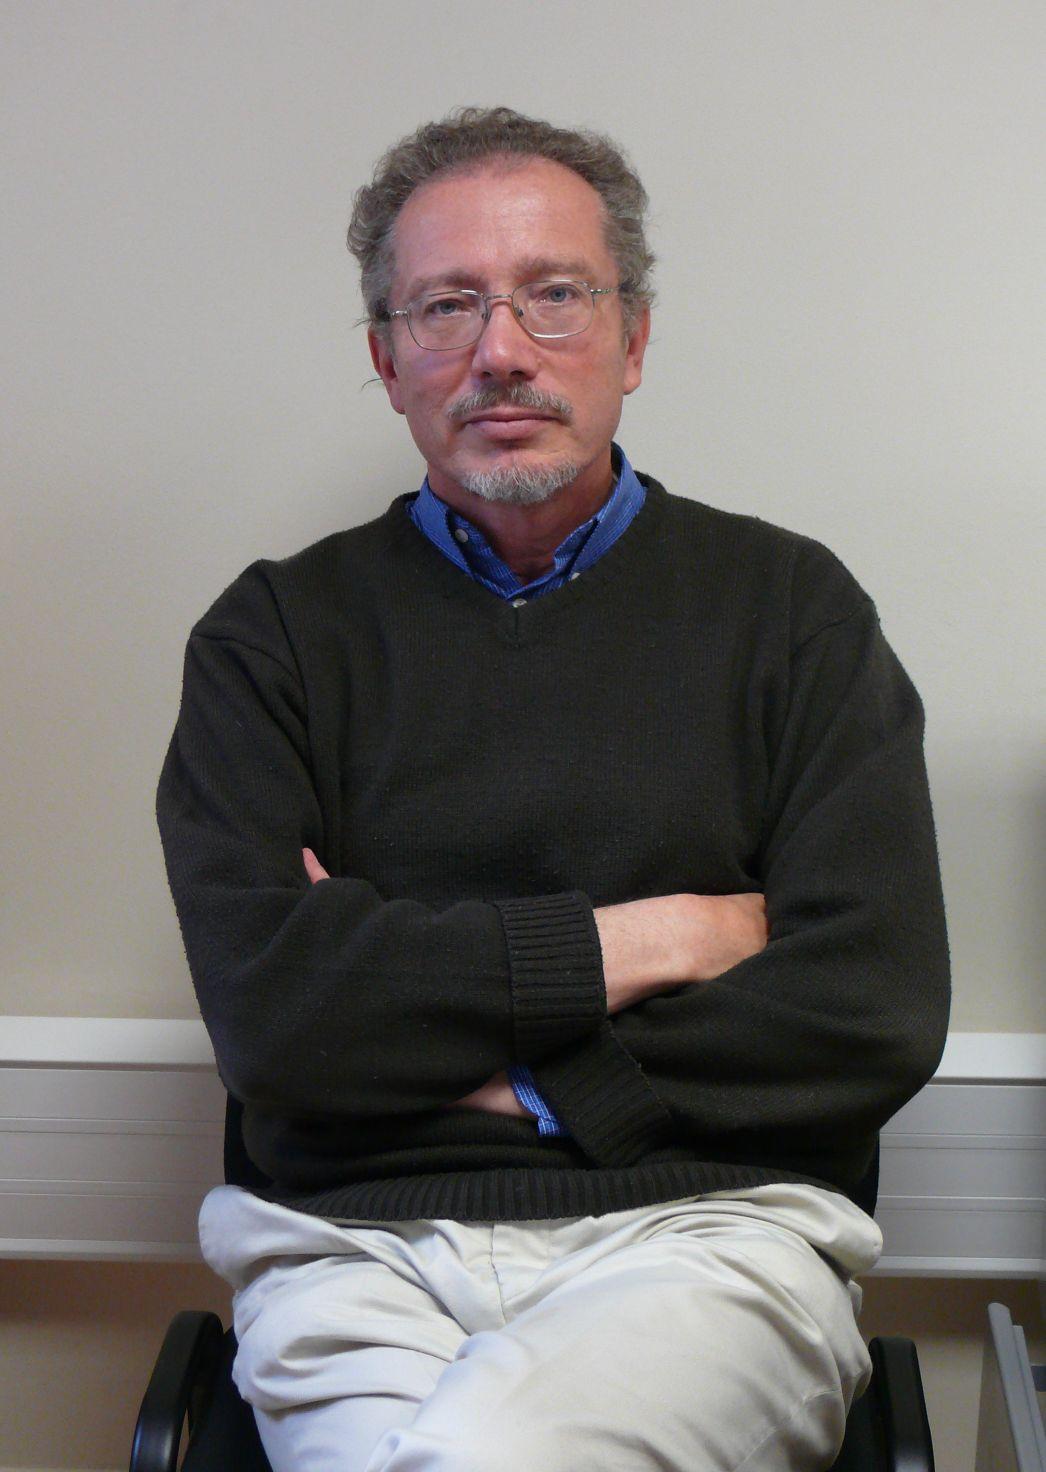 Jean-Paul Delahaye